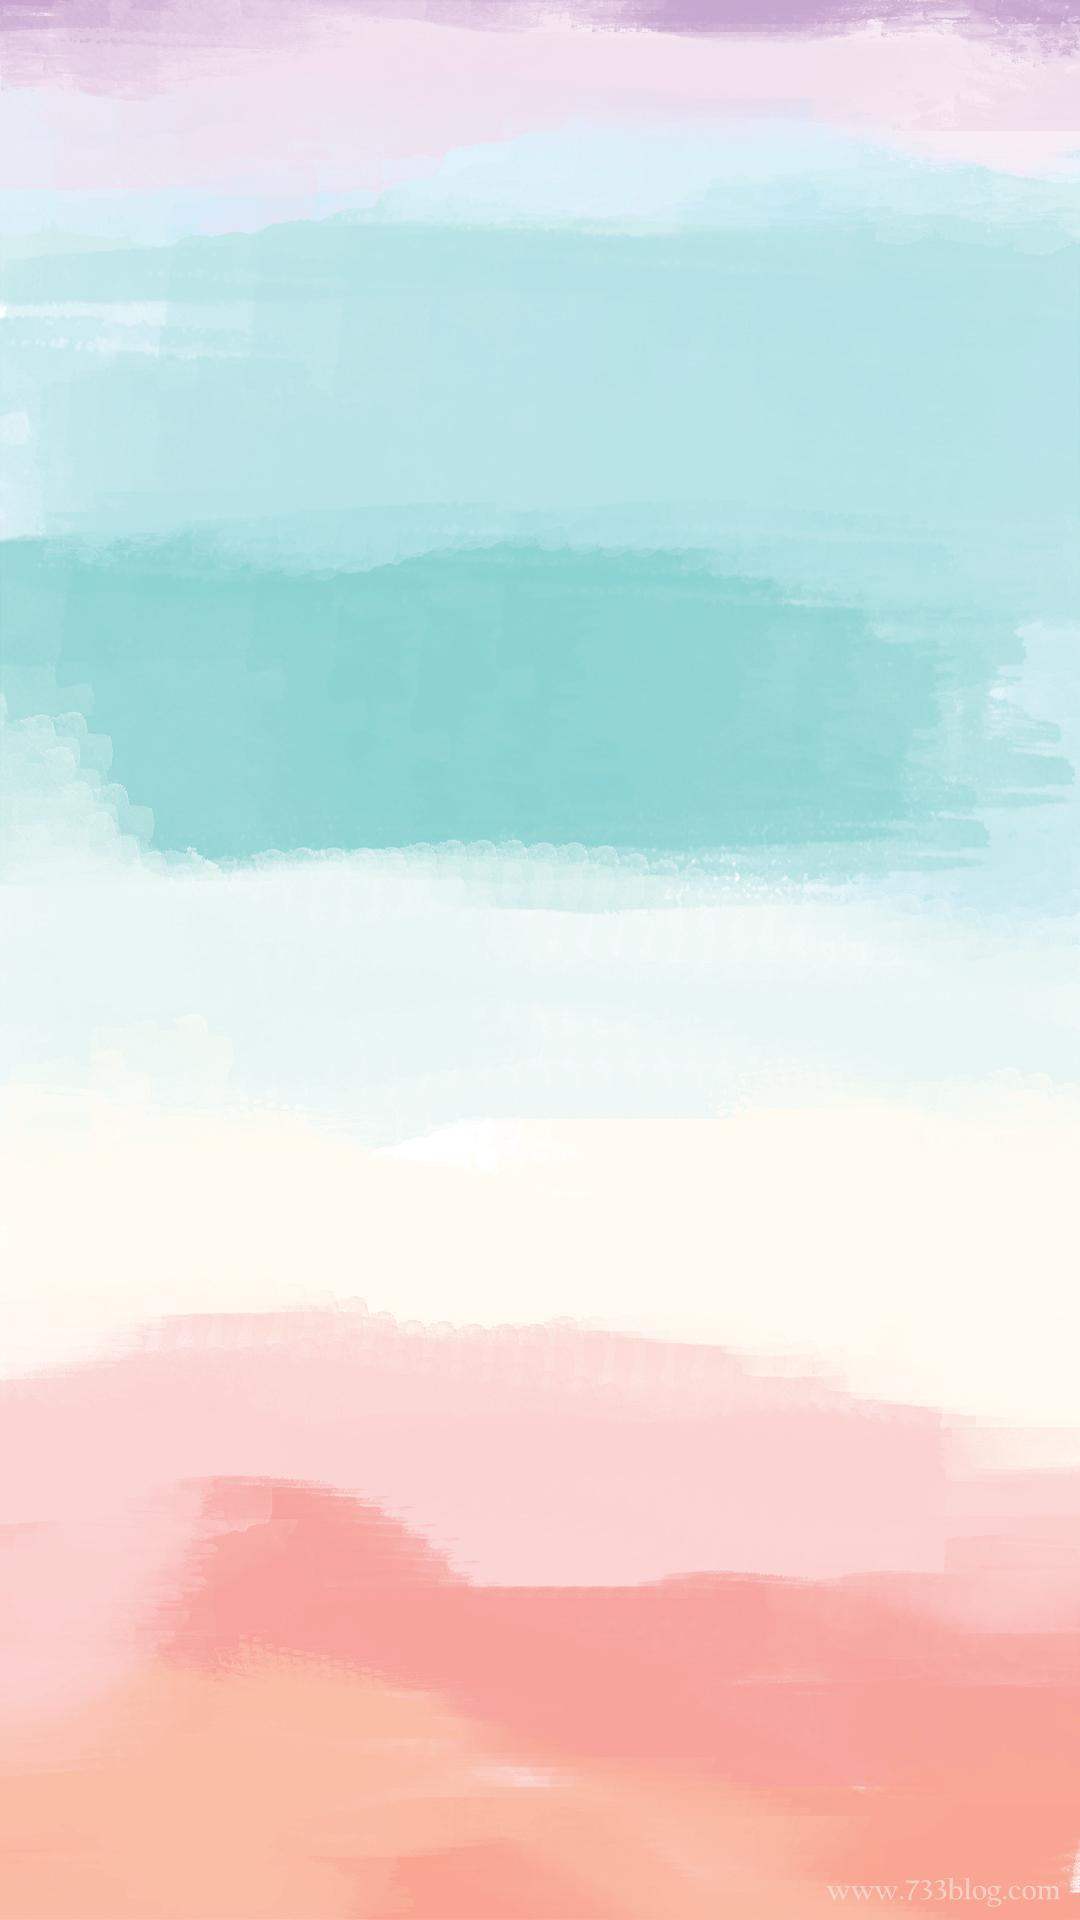 Free Watercolor Iphone Wallpaper Watercolor Wallpaper Pastel Background Wallpapers Simple Iphone Wallpaper